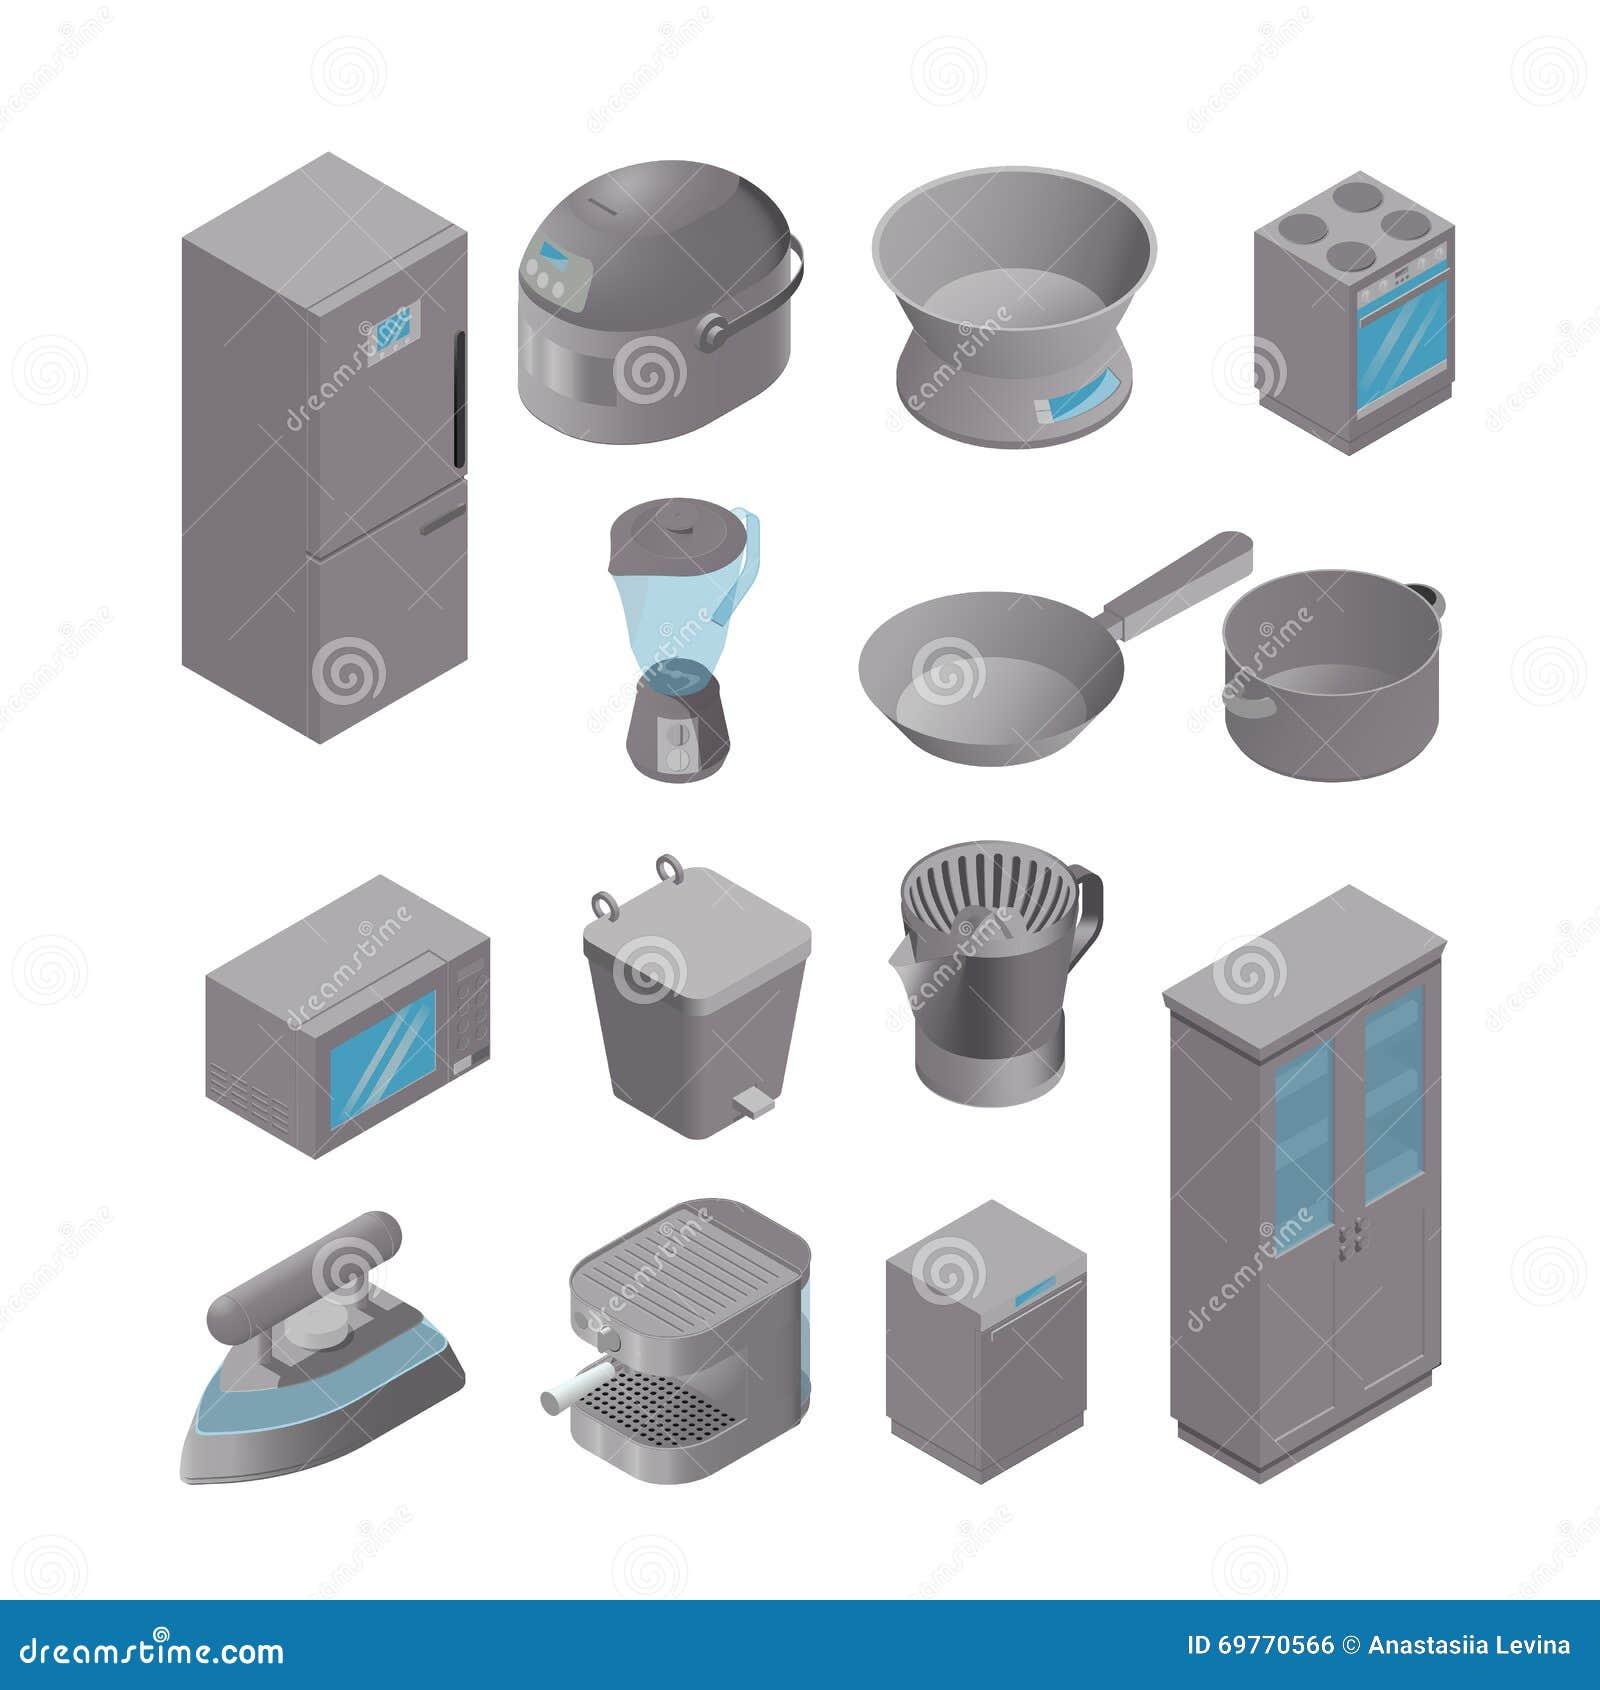 Uncategorized Game Kitchen Appliances isometric set of kitchen appliances stock illustration image appliances